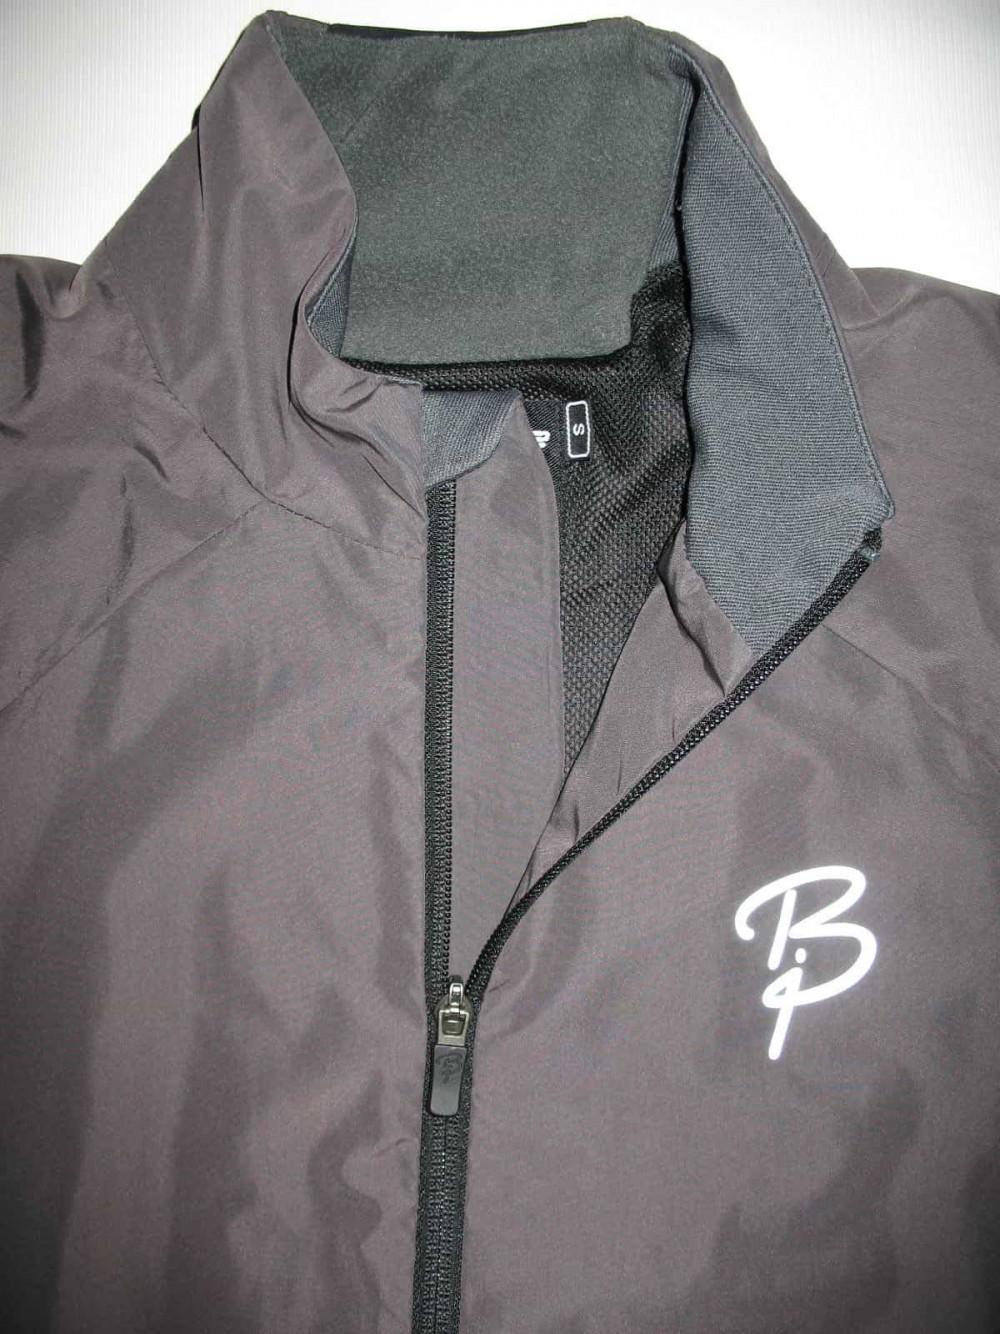 Куртка BJORN DAEHLIE by ODLO logic windproof jacket (размер S/M) - 3